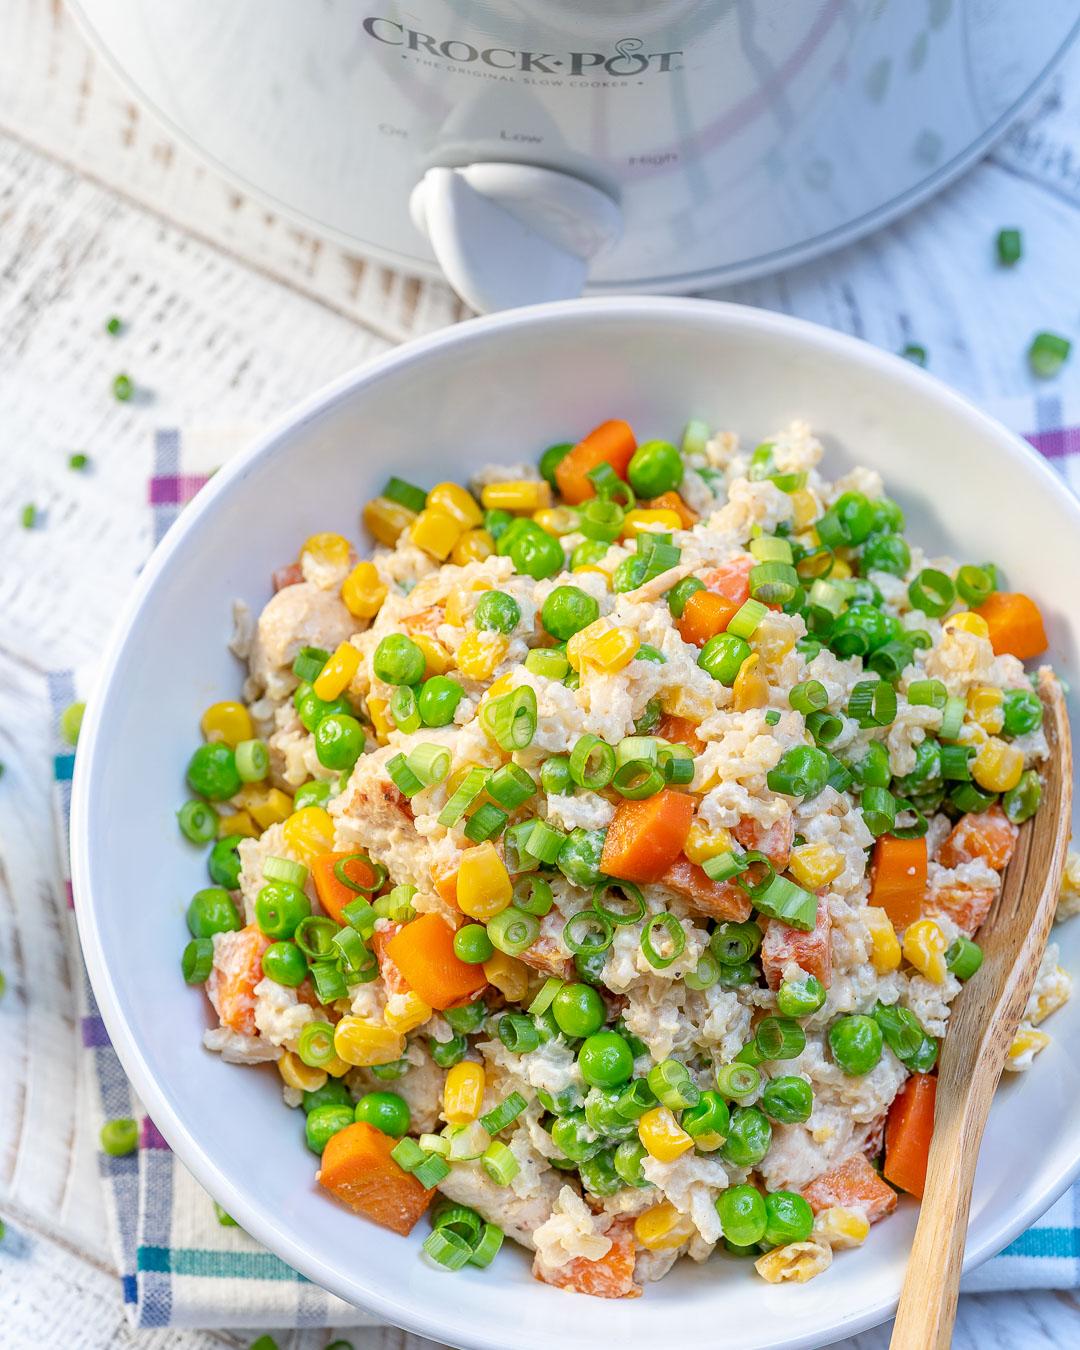 Steamy and Tasty Chicken Rice Dish